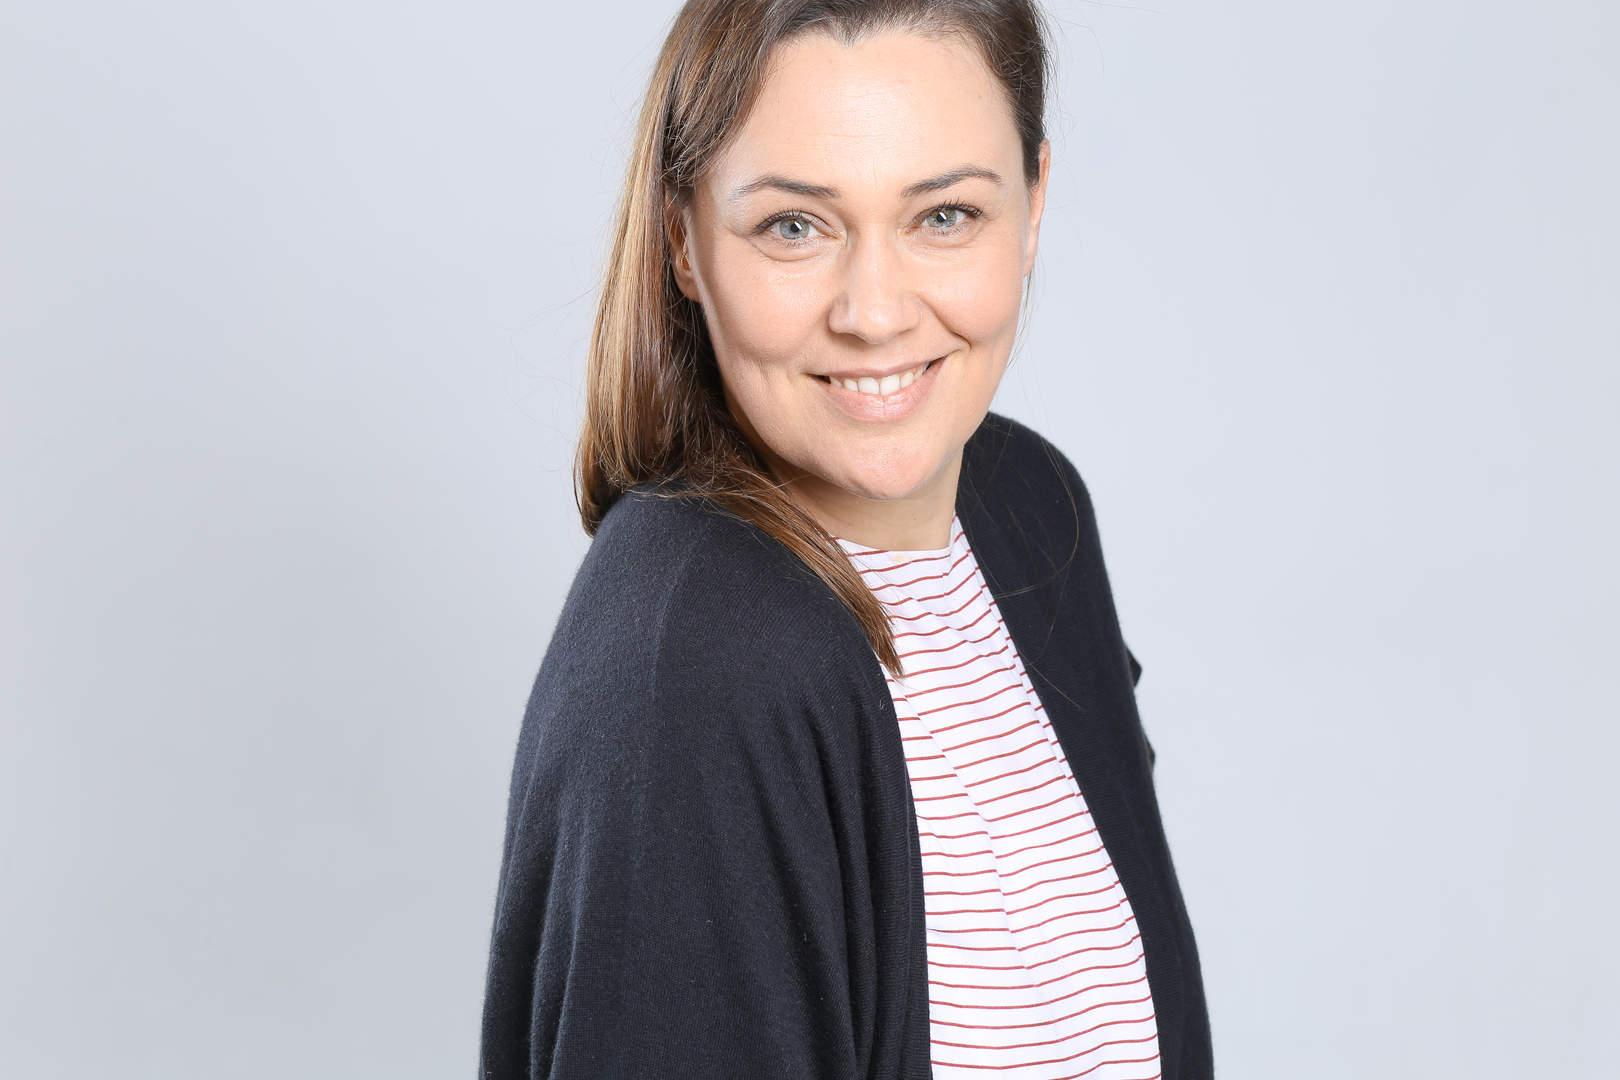 Nicole Reif